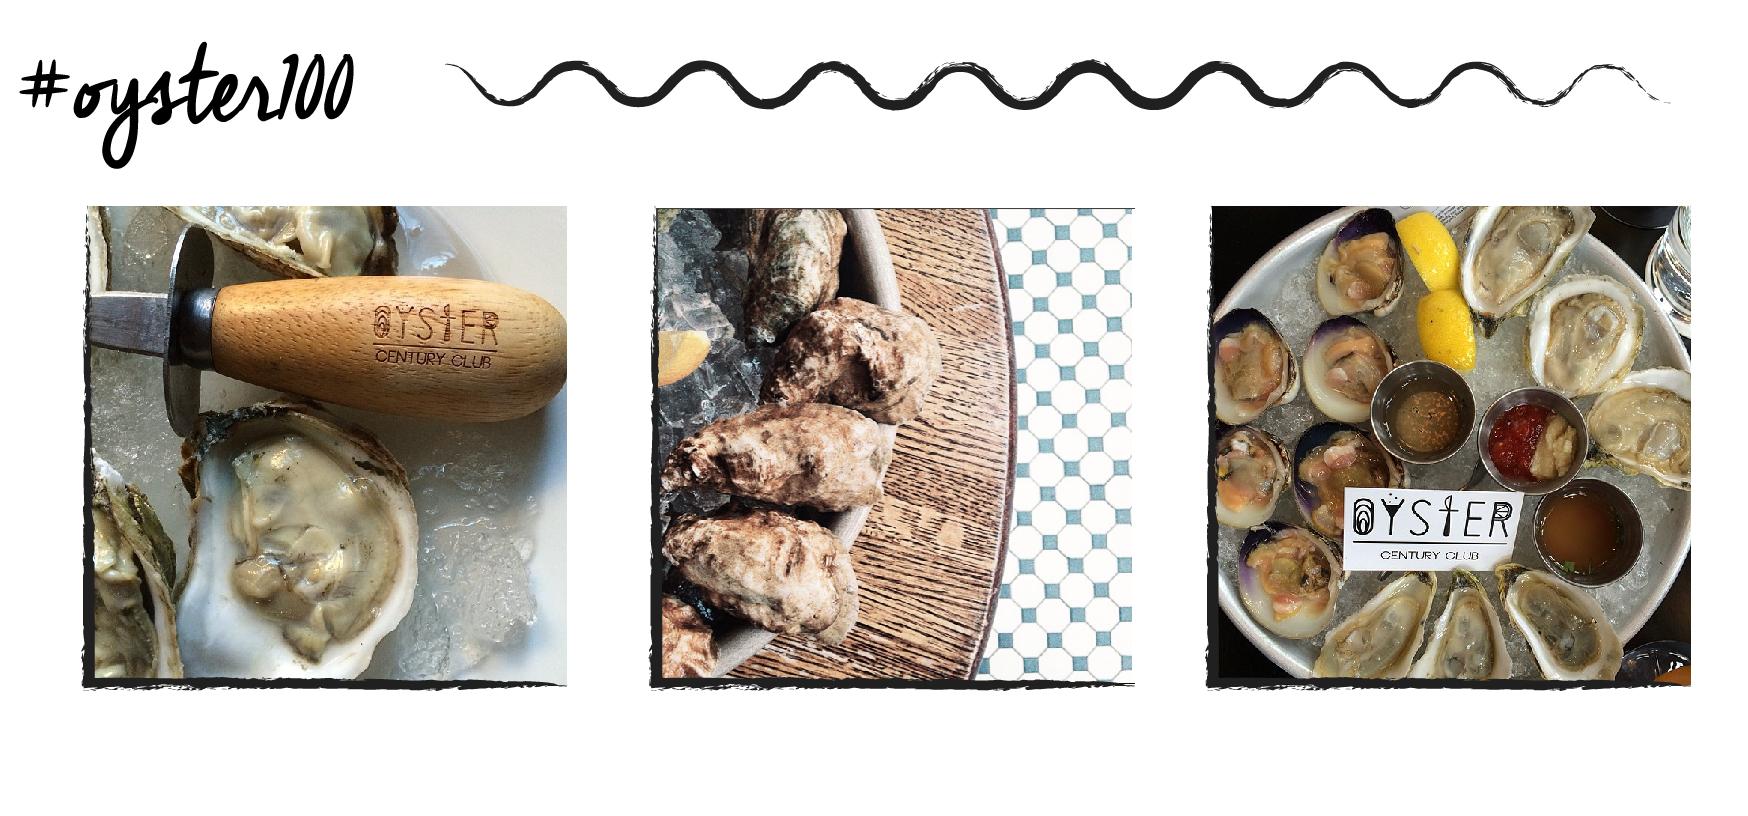 oyster images-01.jpg